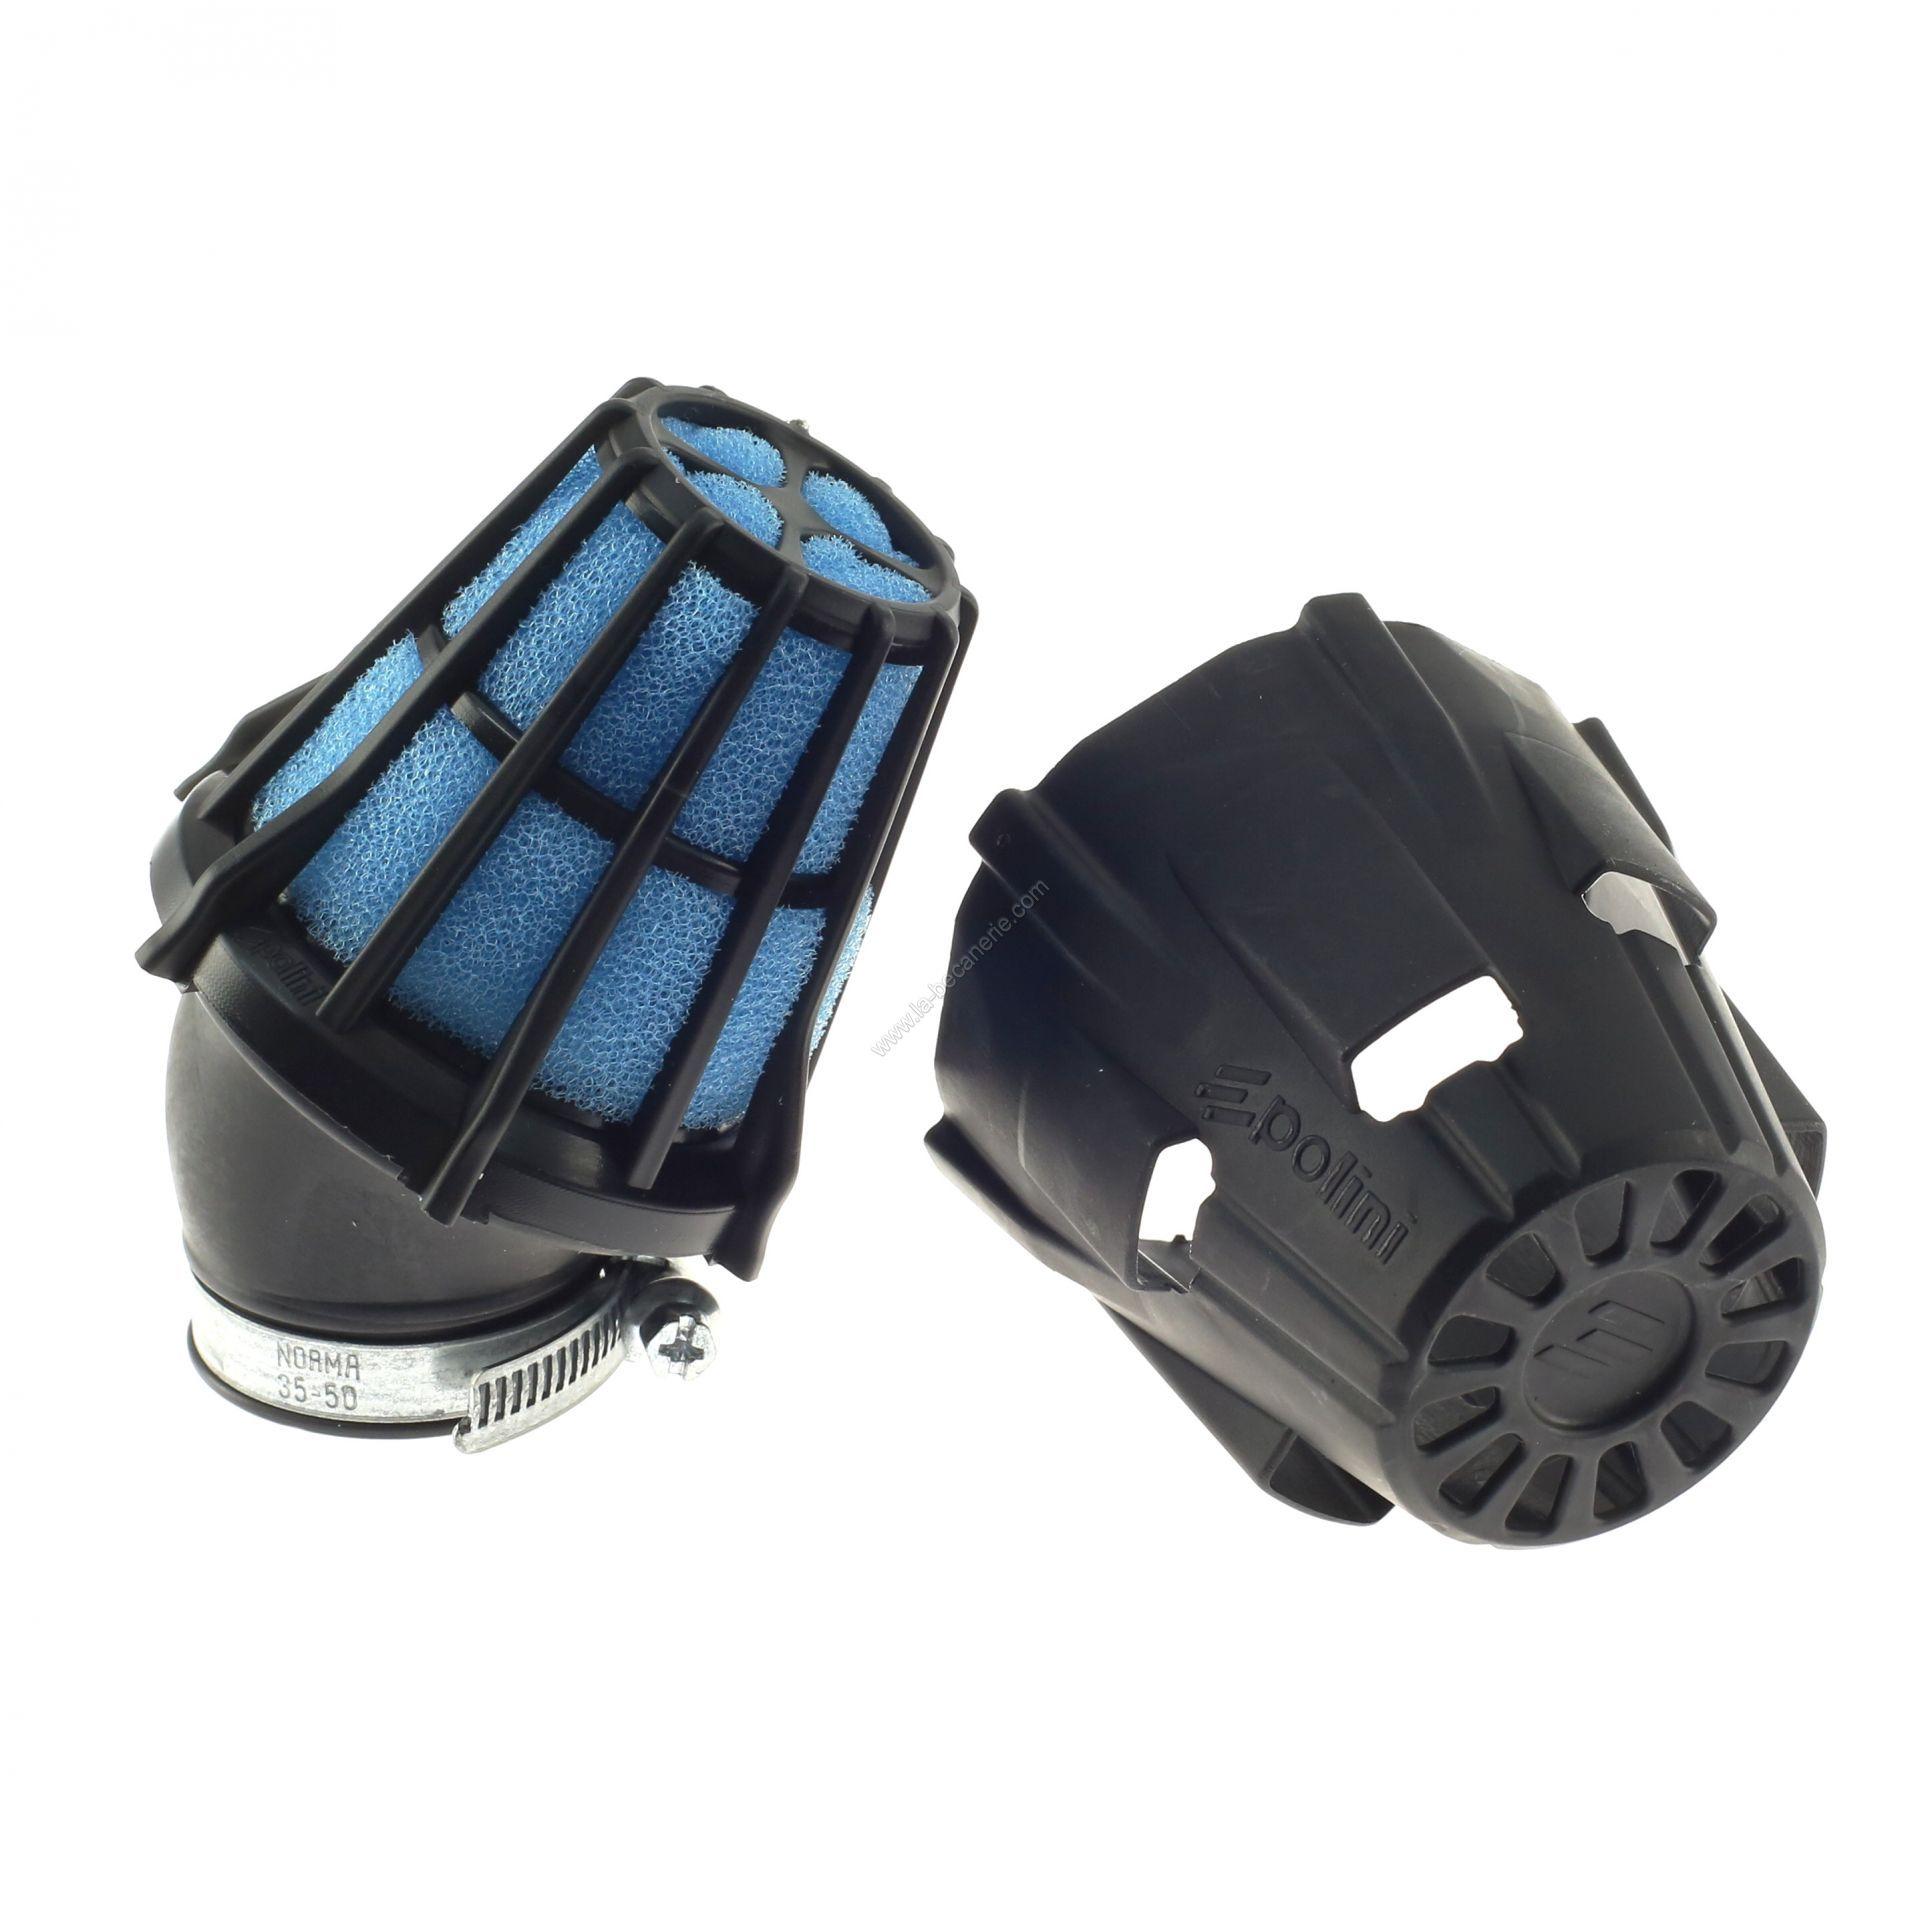 filtre air scooter pi ces carburation scooter sur la b canerie. Black Bedroom Furniture Sets. Home Design Ideas